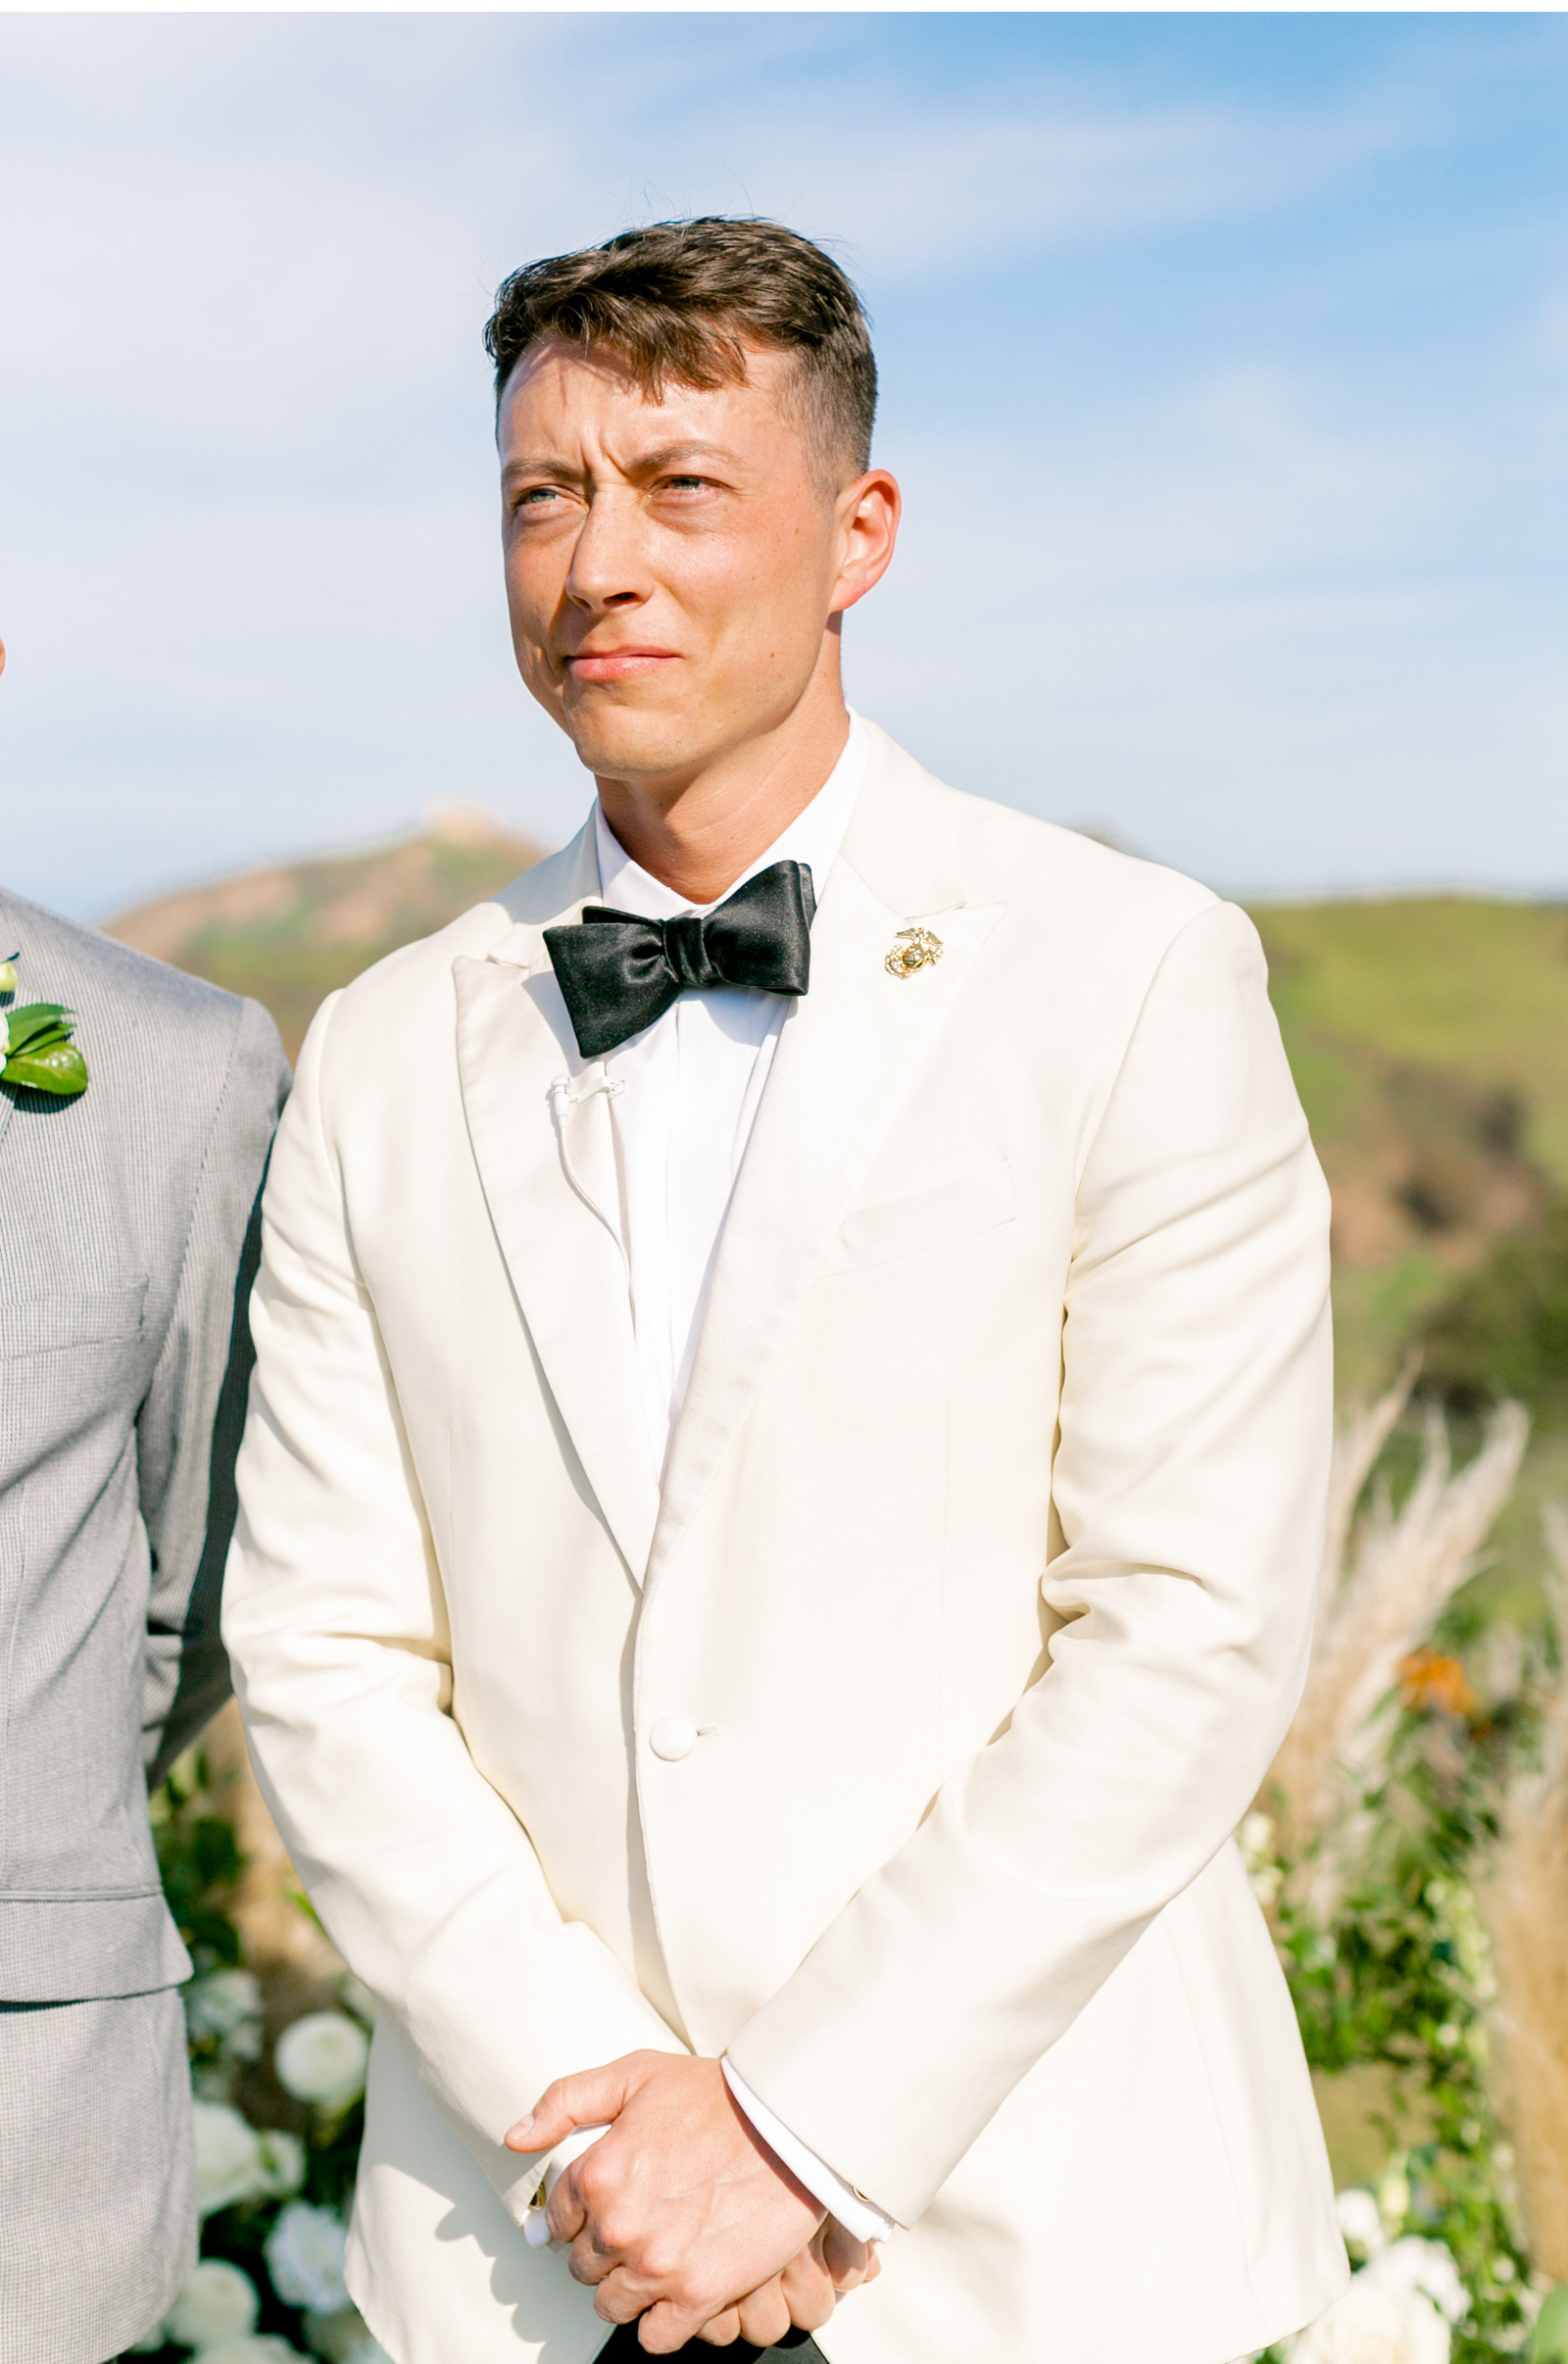 Southern-California-Wedding-Photographer-Natalie-Schutt-Photography-Style-Me-Pretty-Malibu-Rocky-Oaks-Photographer_09.jpg